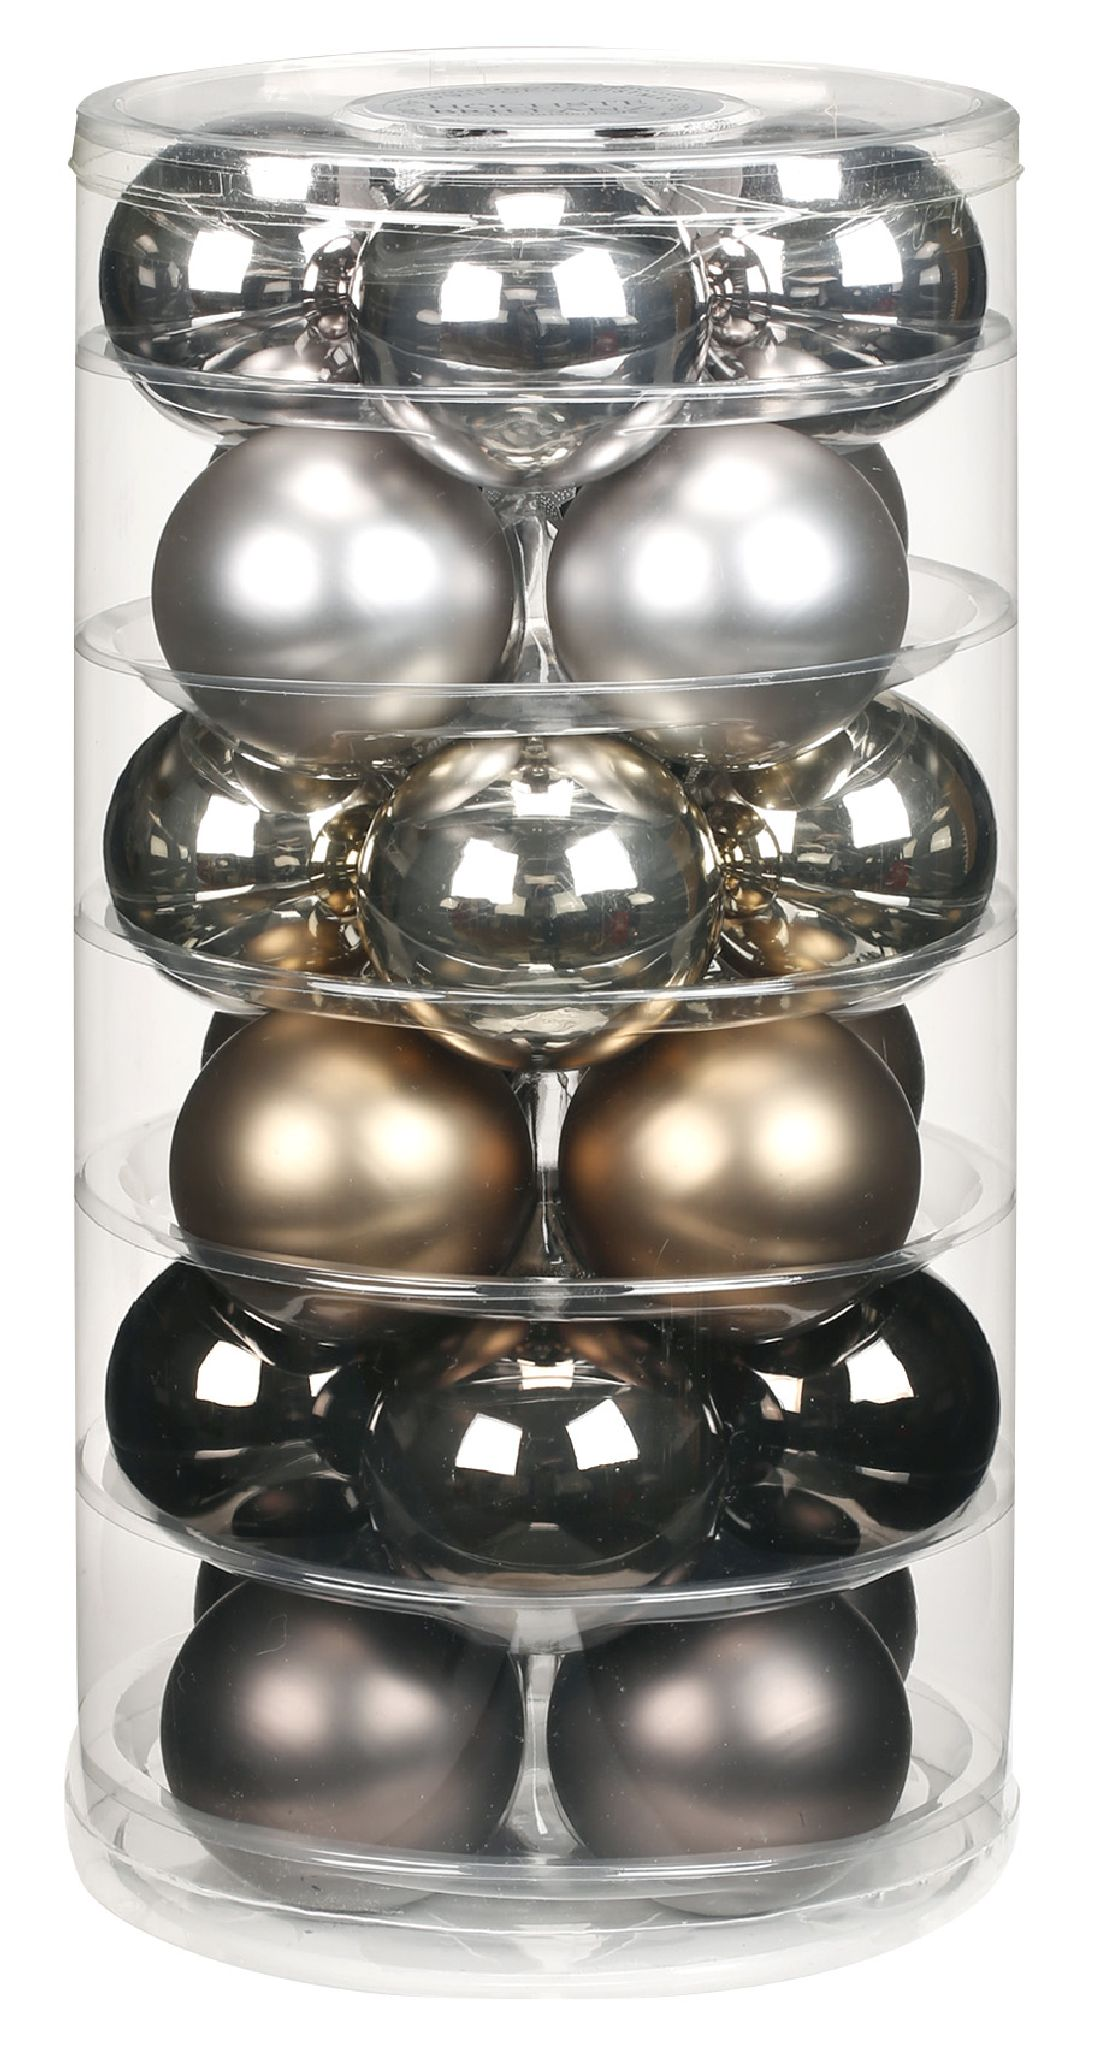 Glaskugeln / Christbaumkugel 15090 GRAU-URBAN-GRAPHIC-MIX 60mm  24Stück